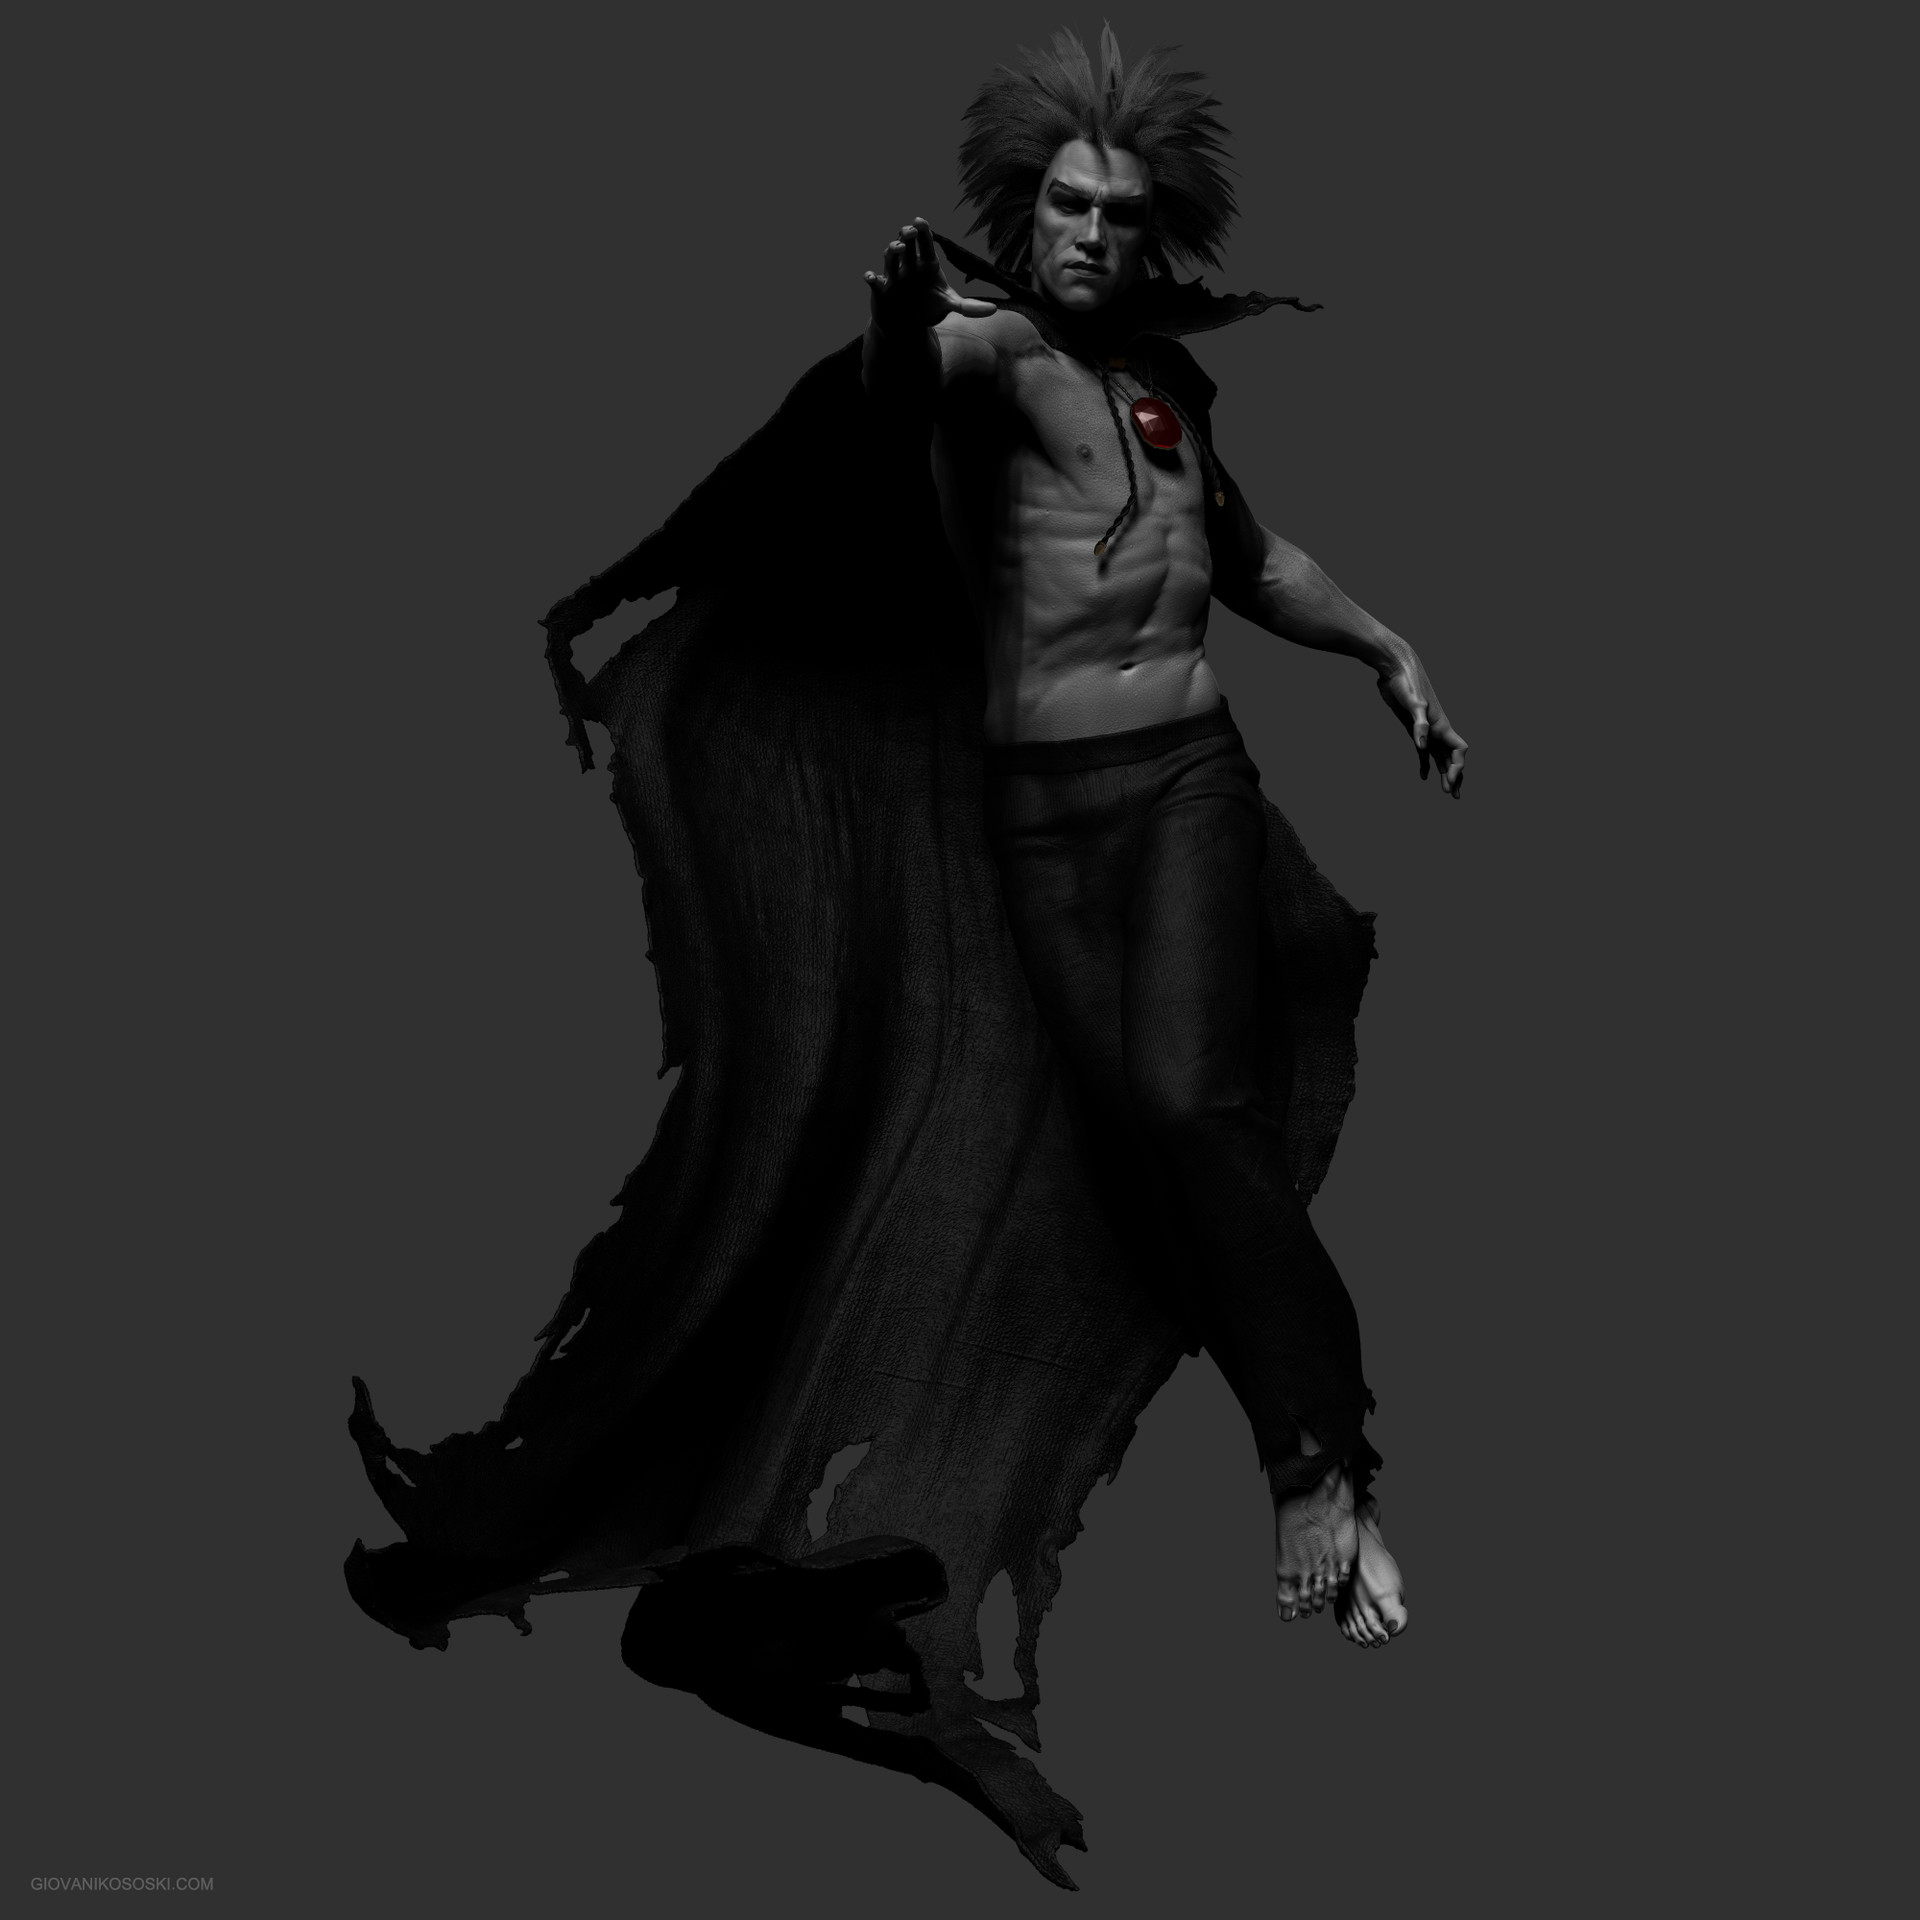 Giovani kososki morpheus 01